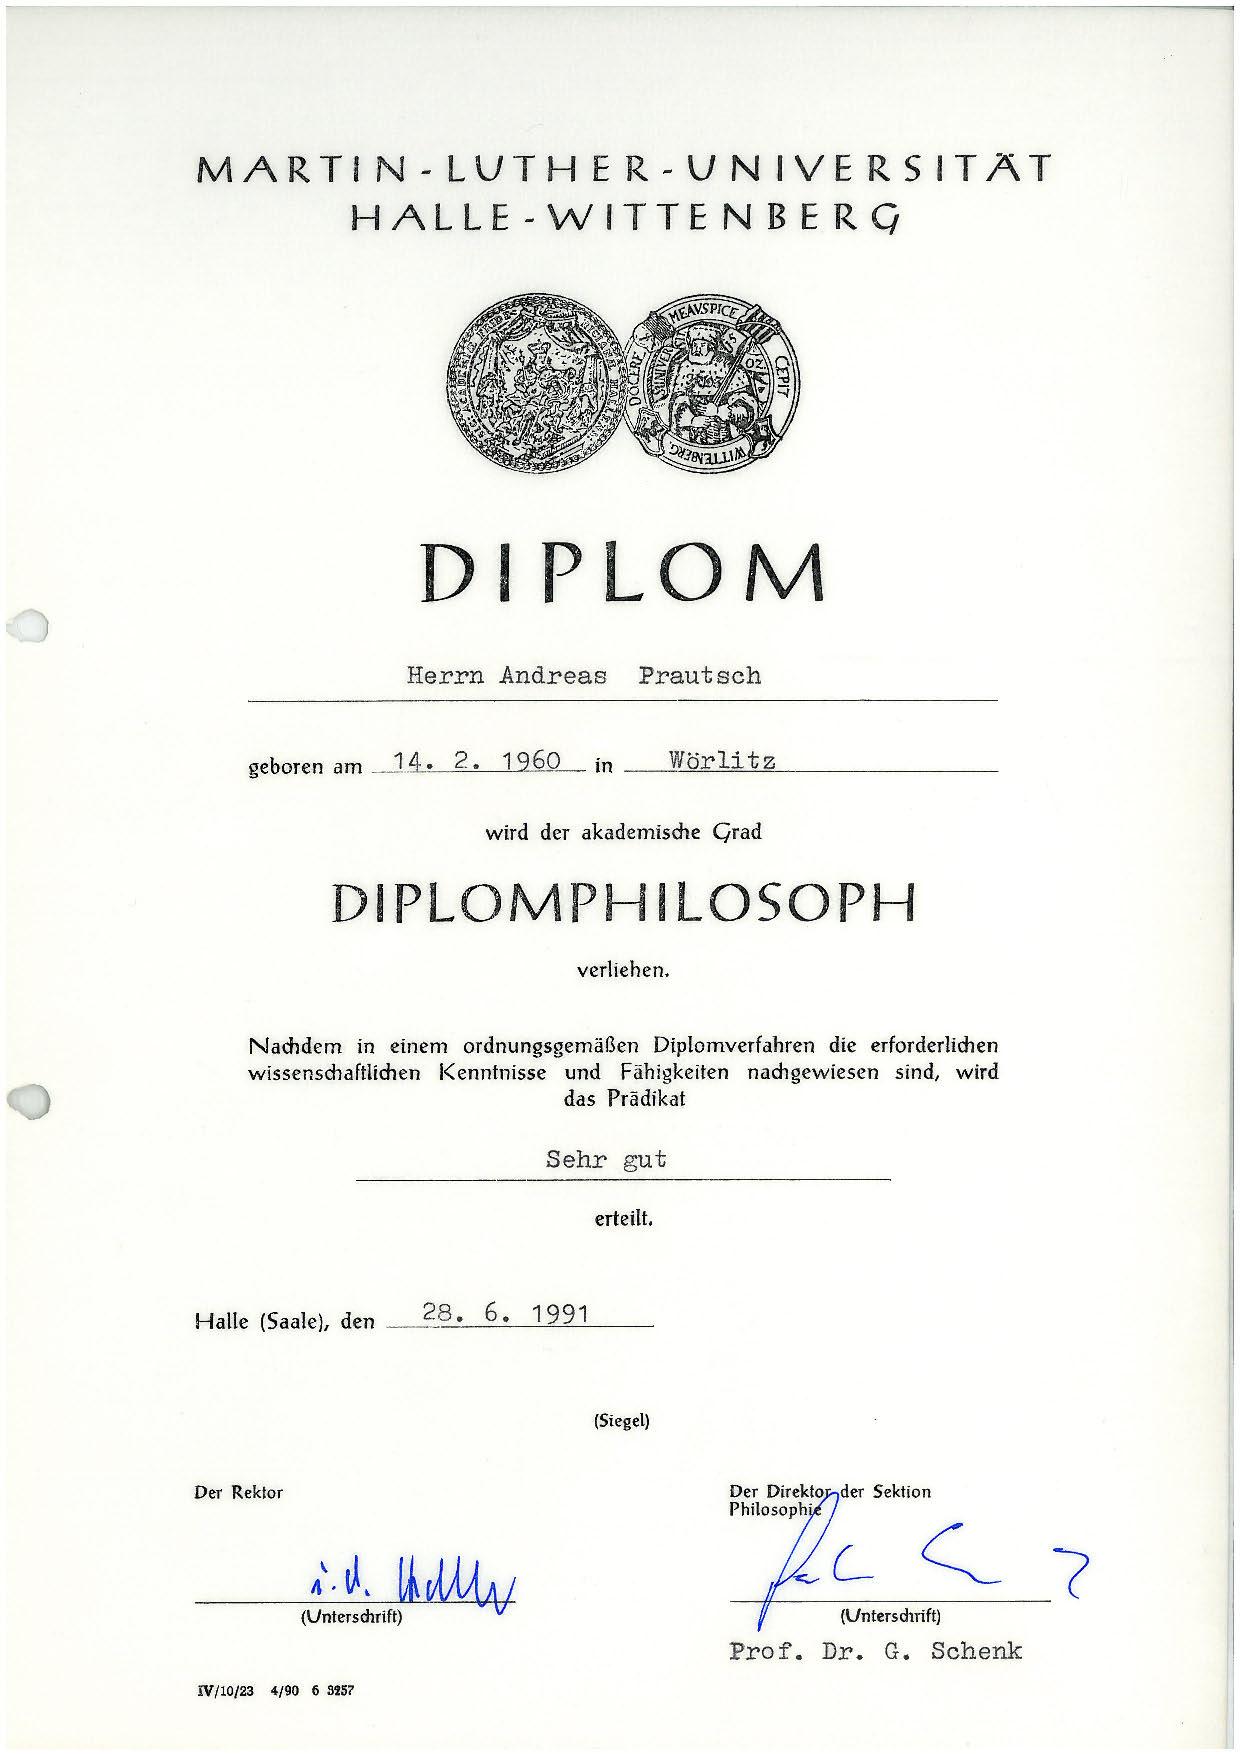 Diplomphilosoph